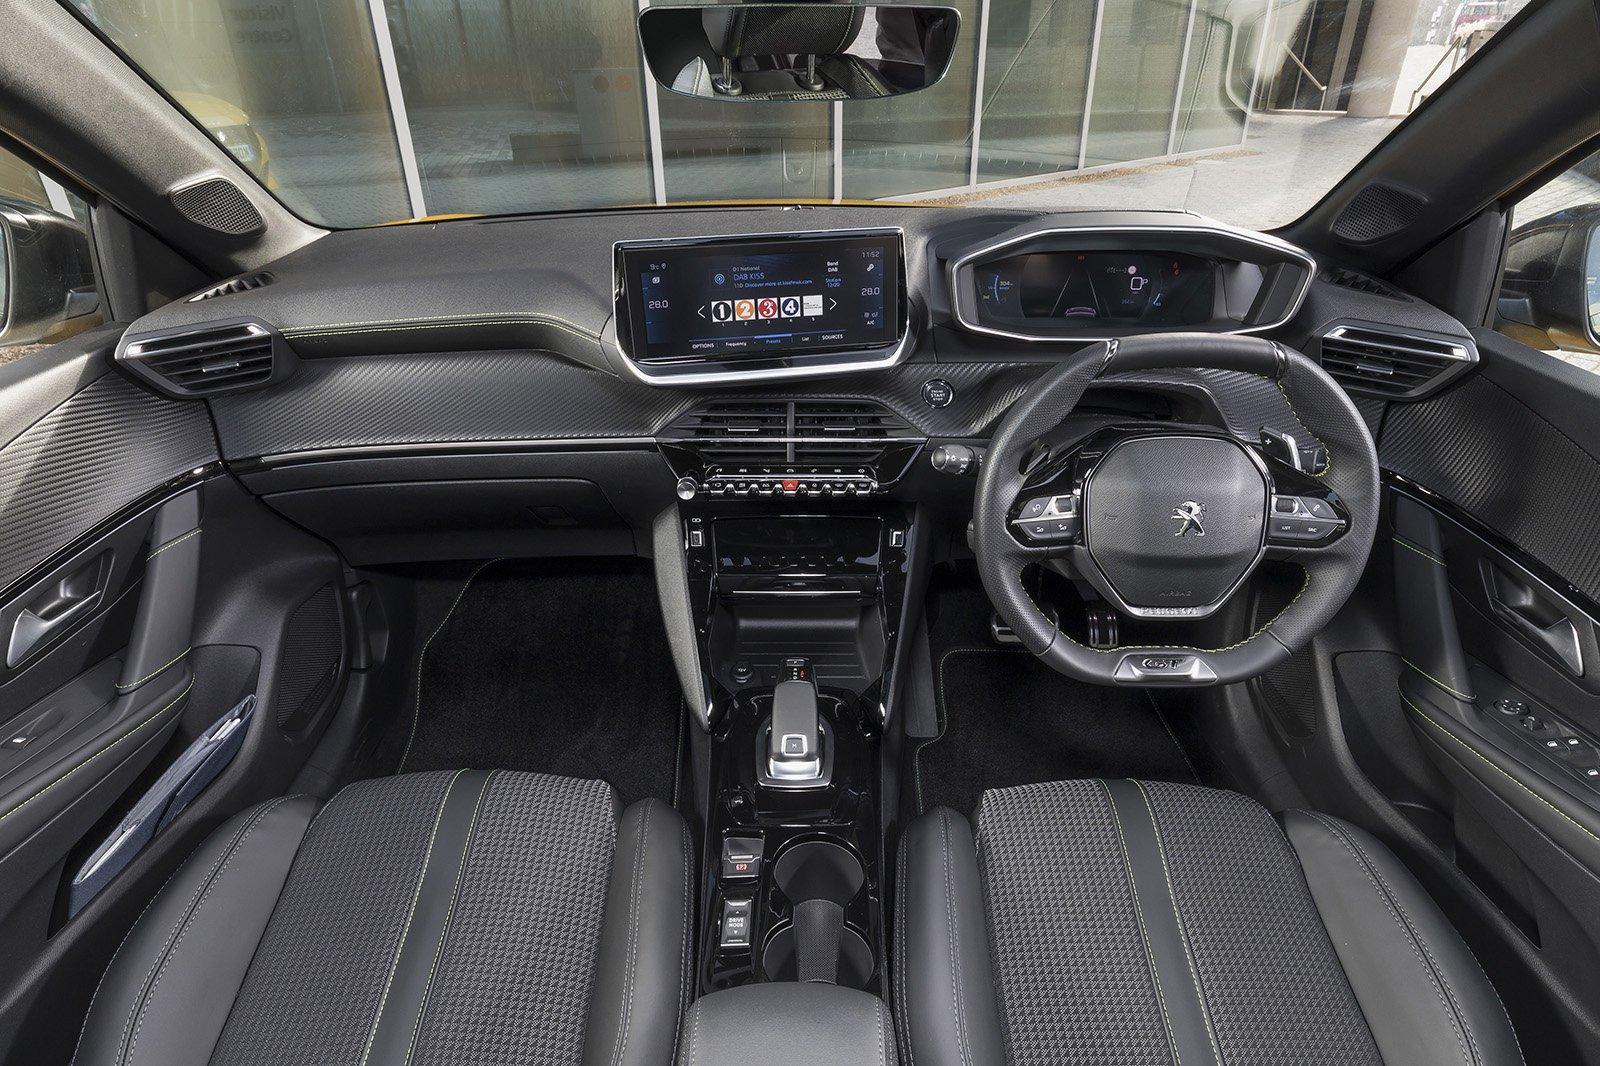 Peugeot 208 2020 RHD dashboard